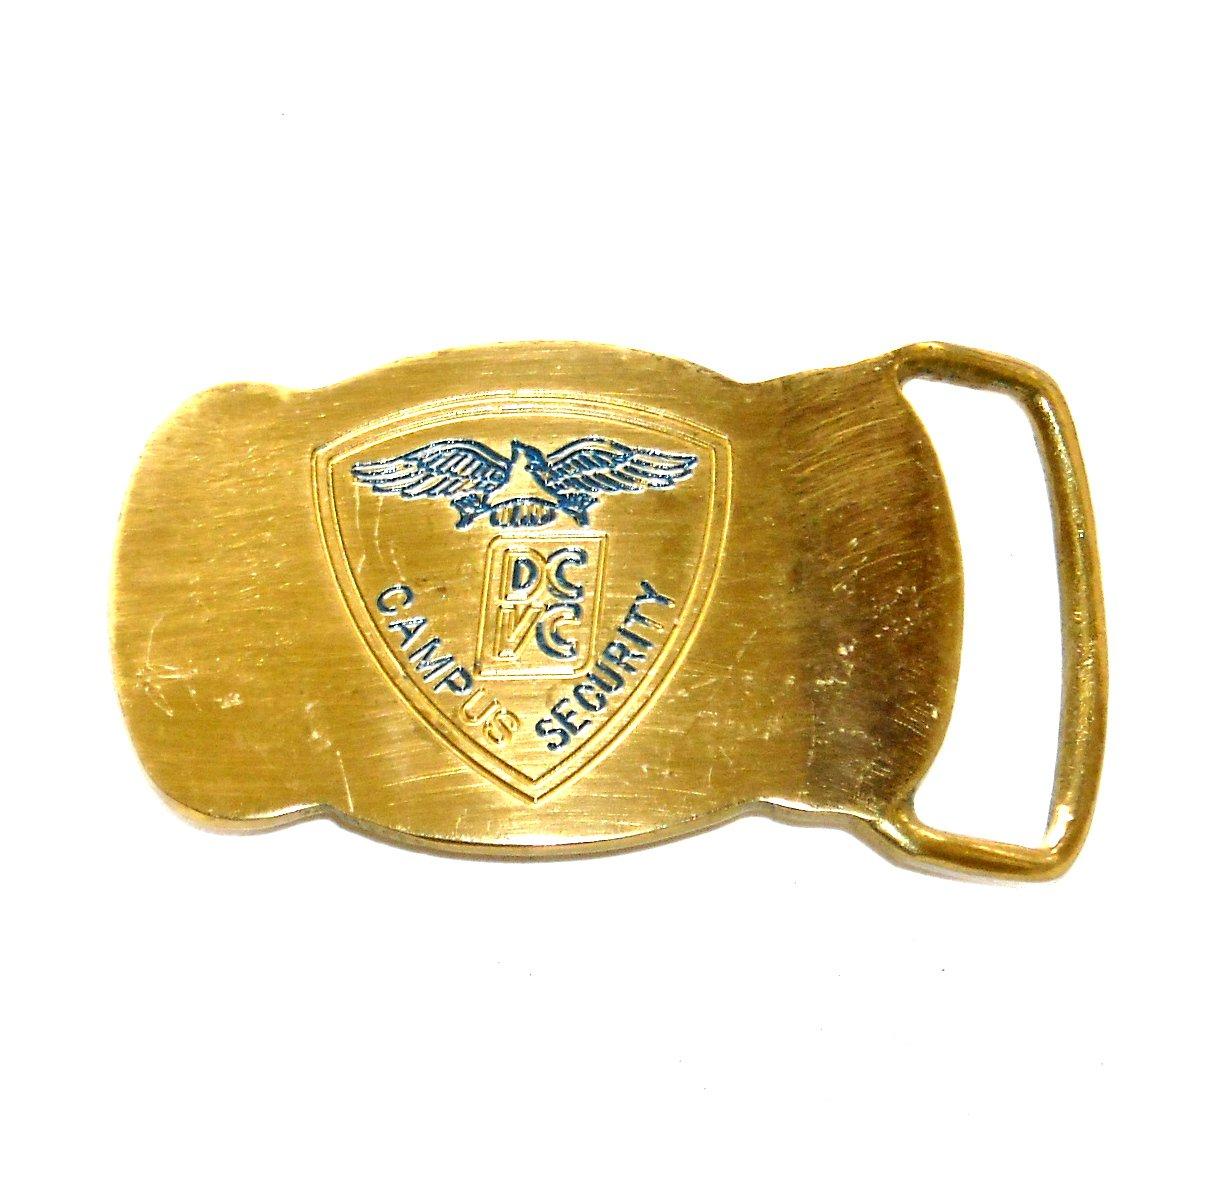 Campus Security DCVC Vintage Solid Brass Belt Buckle